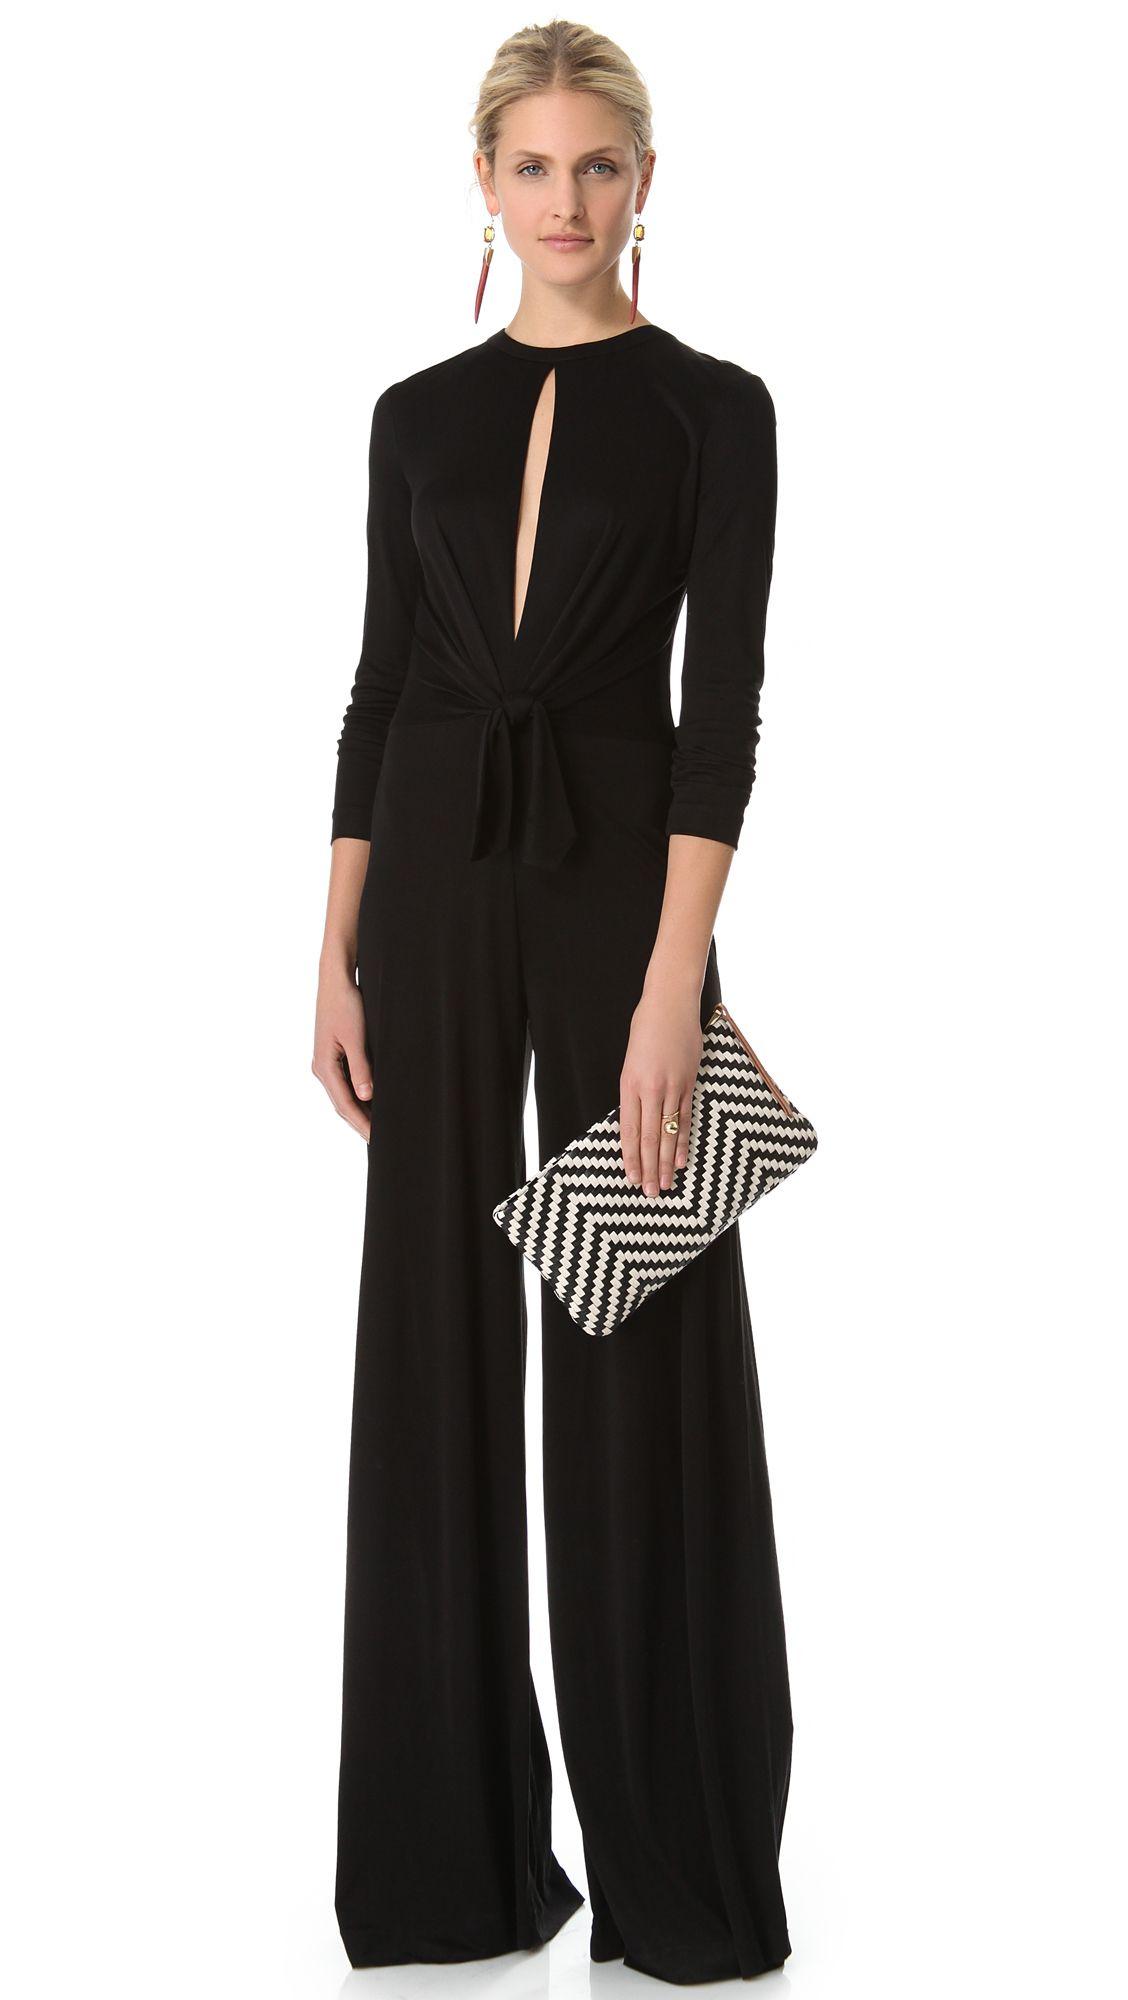 1c70b91f868 Women s Black Long Sleeve Jumpsuit